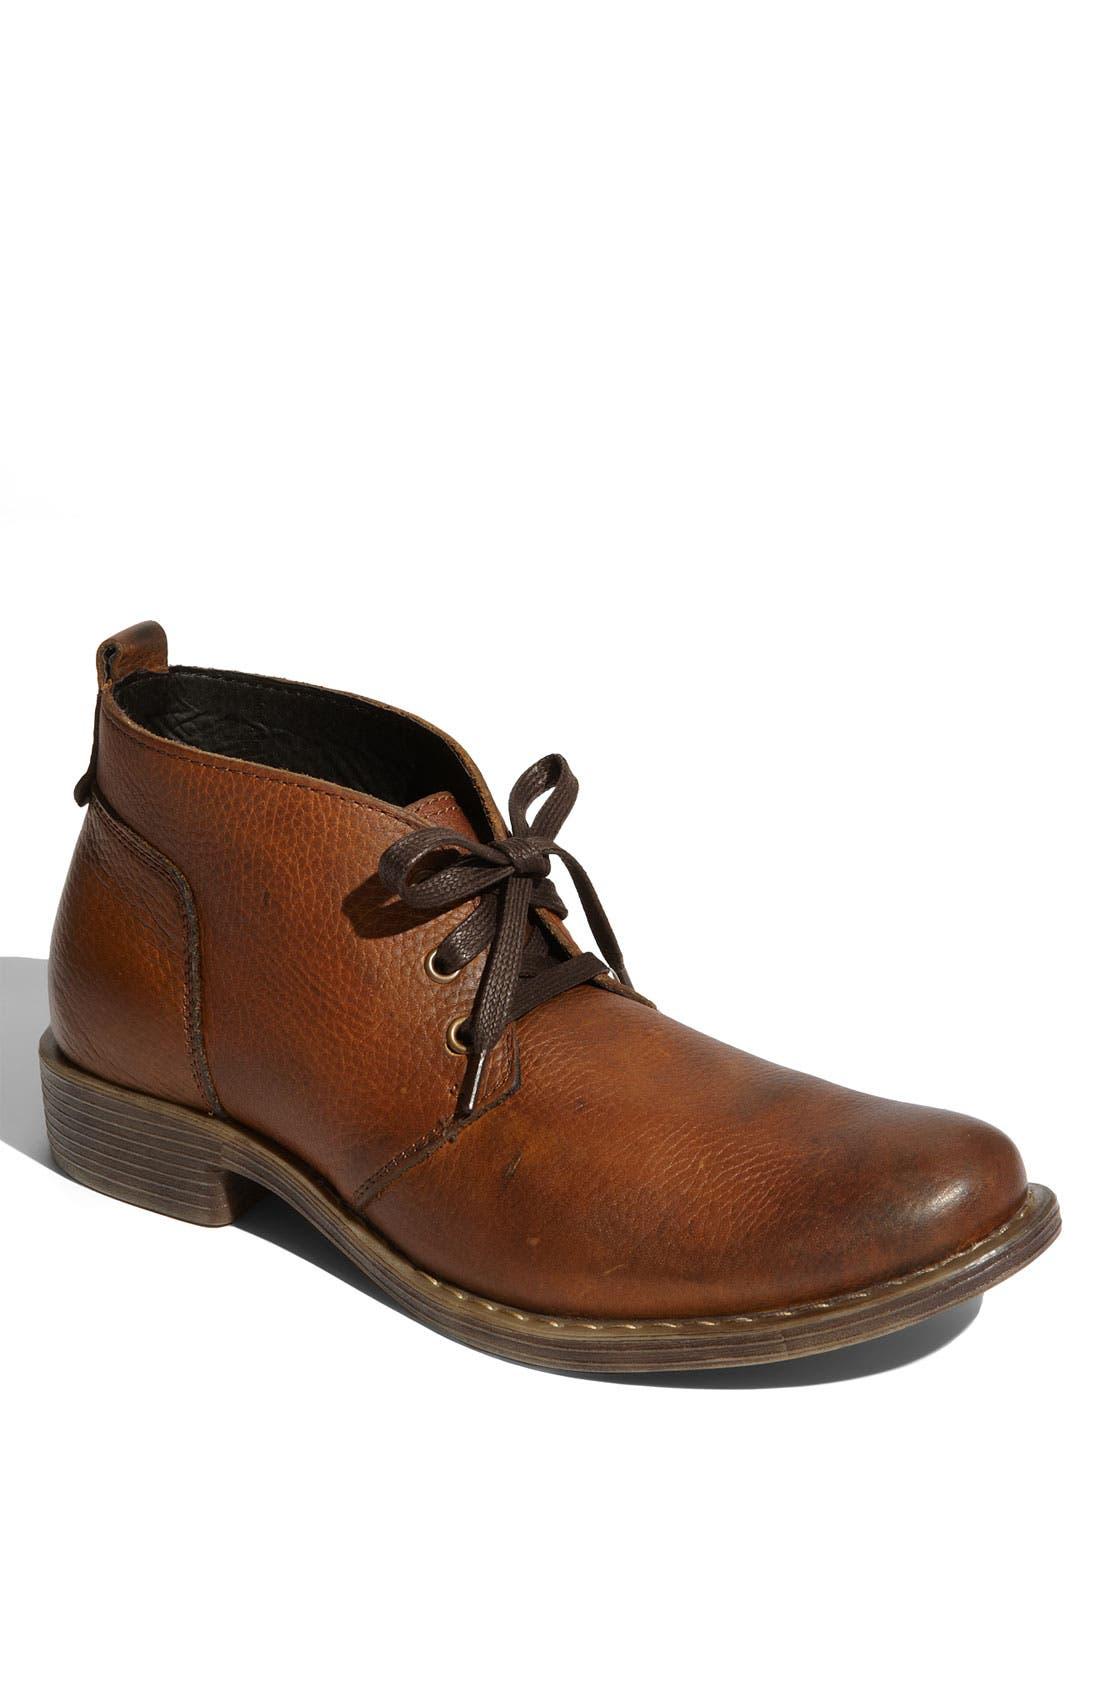 'Houston' Chukka Boot,                         Main,                         color, 220